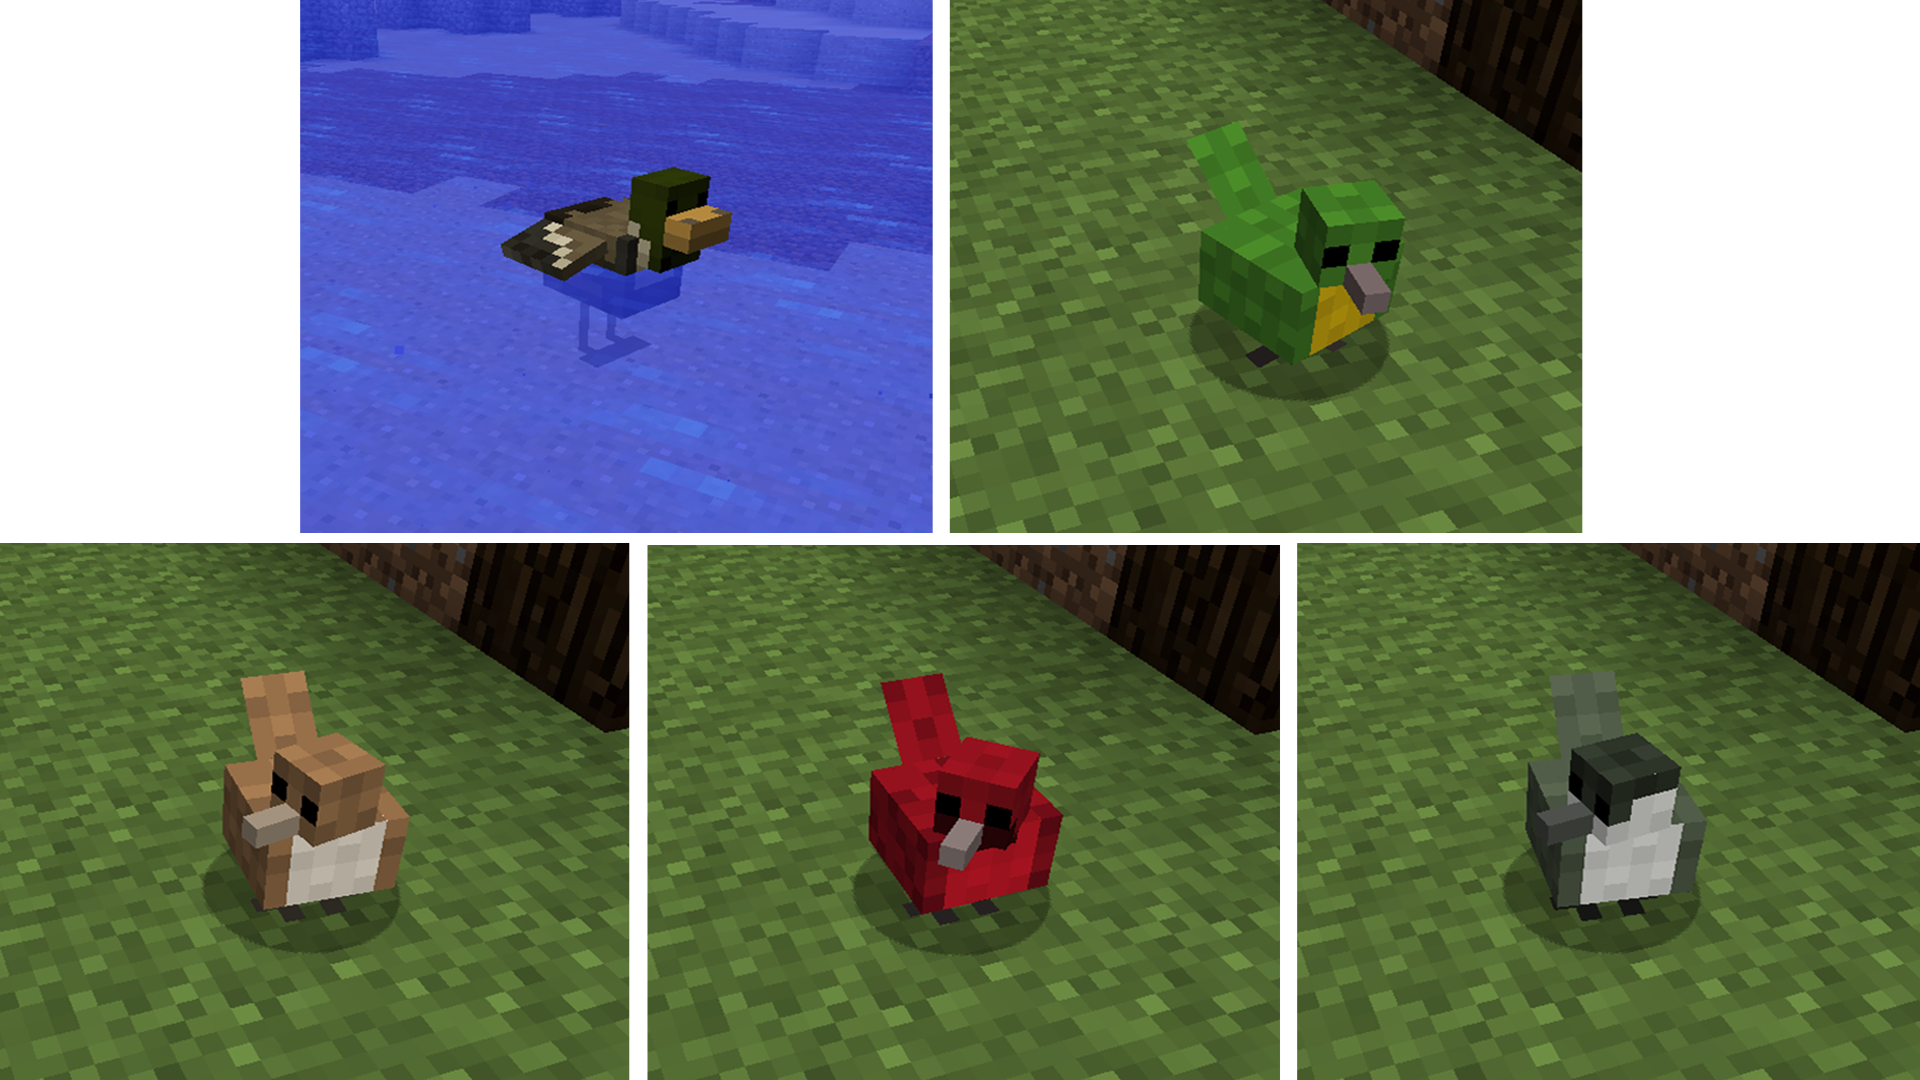 minecraft watch dogs mod